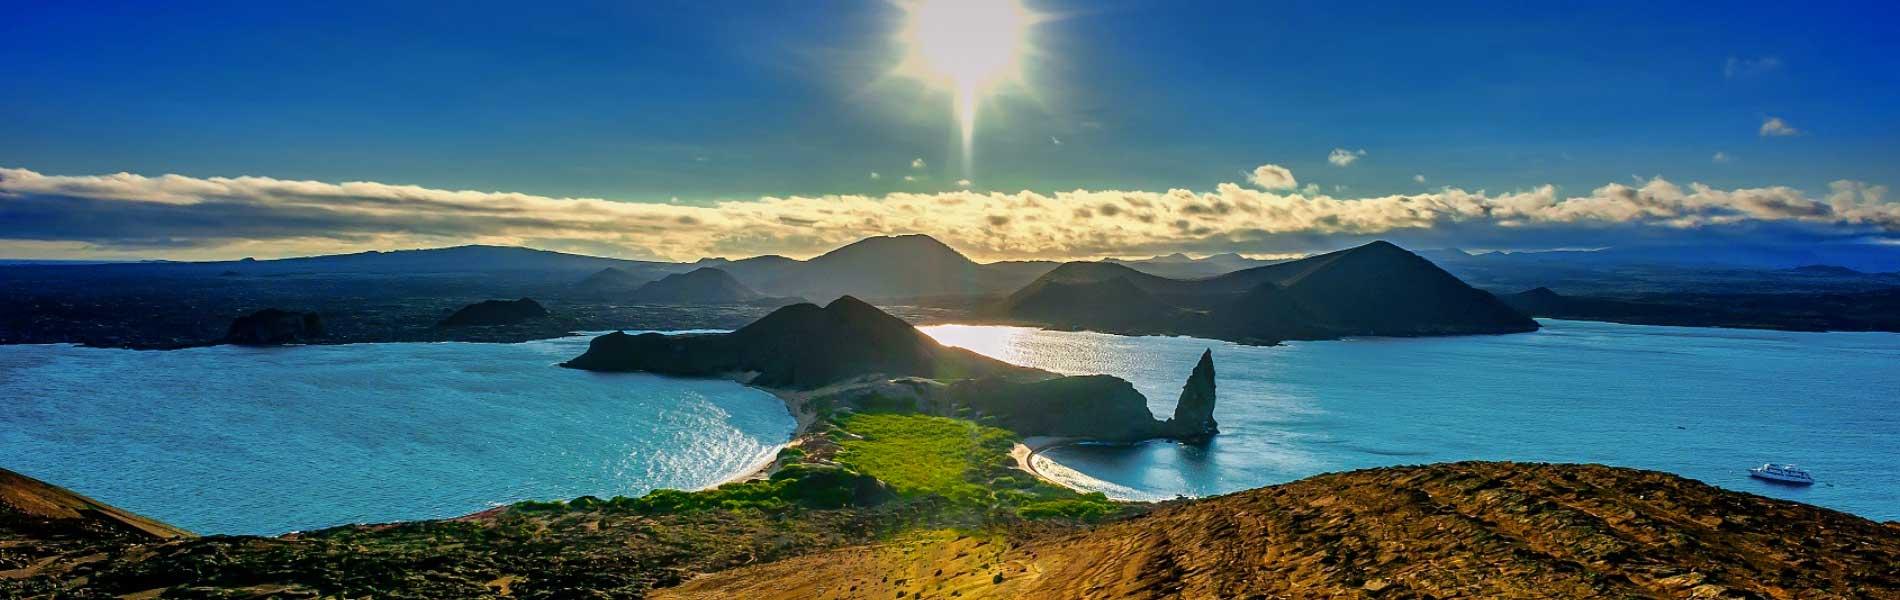 Peru Tourist Information discount: 20% off Latin America adventures